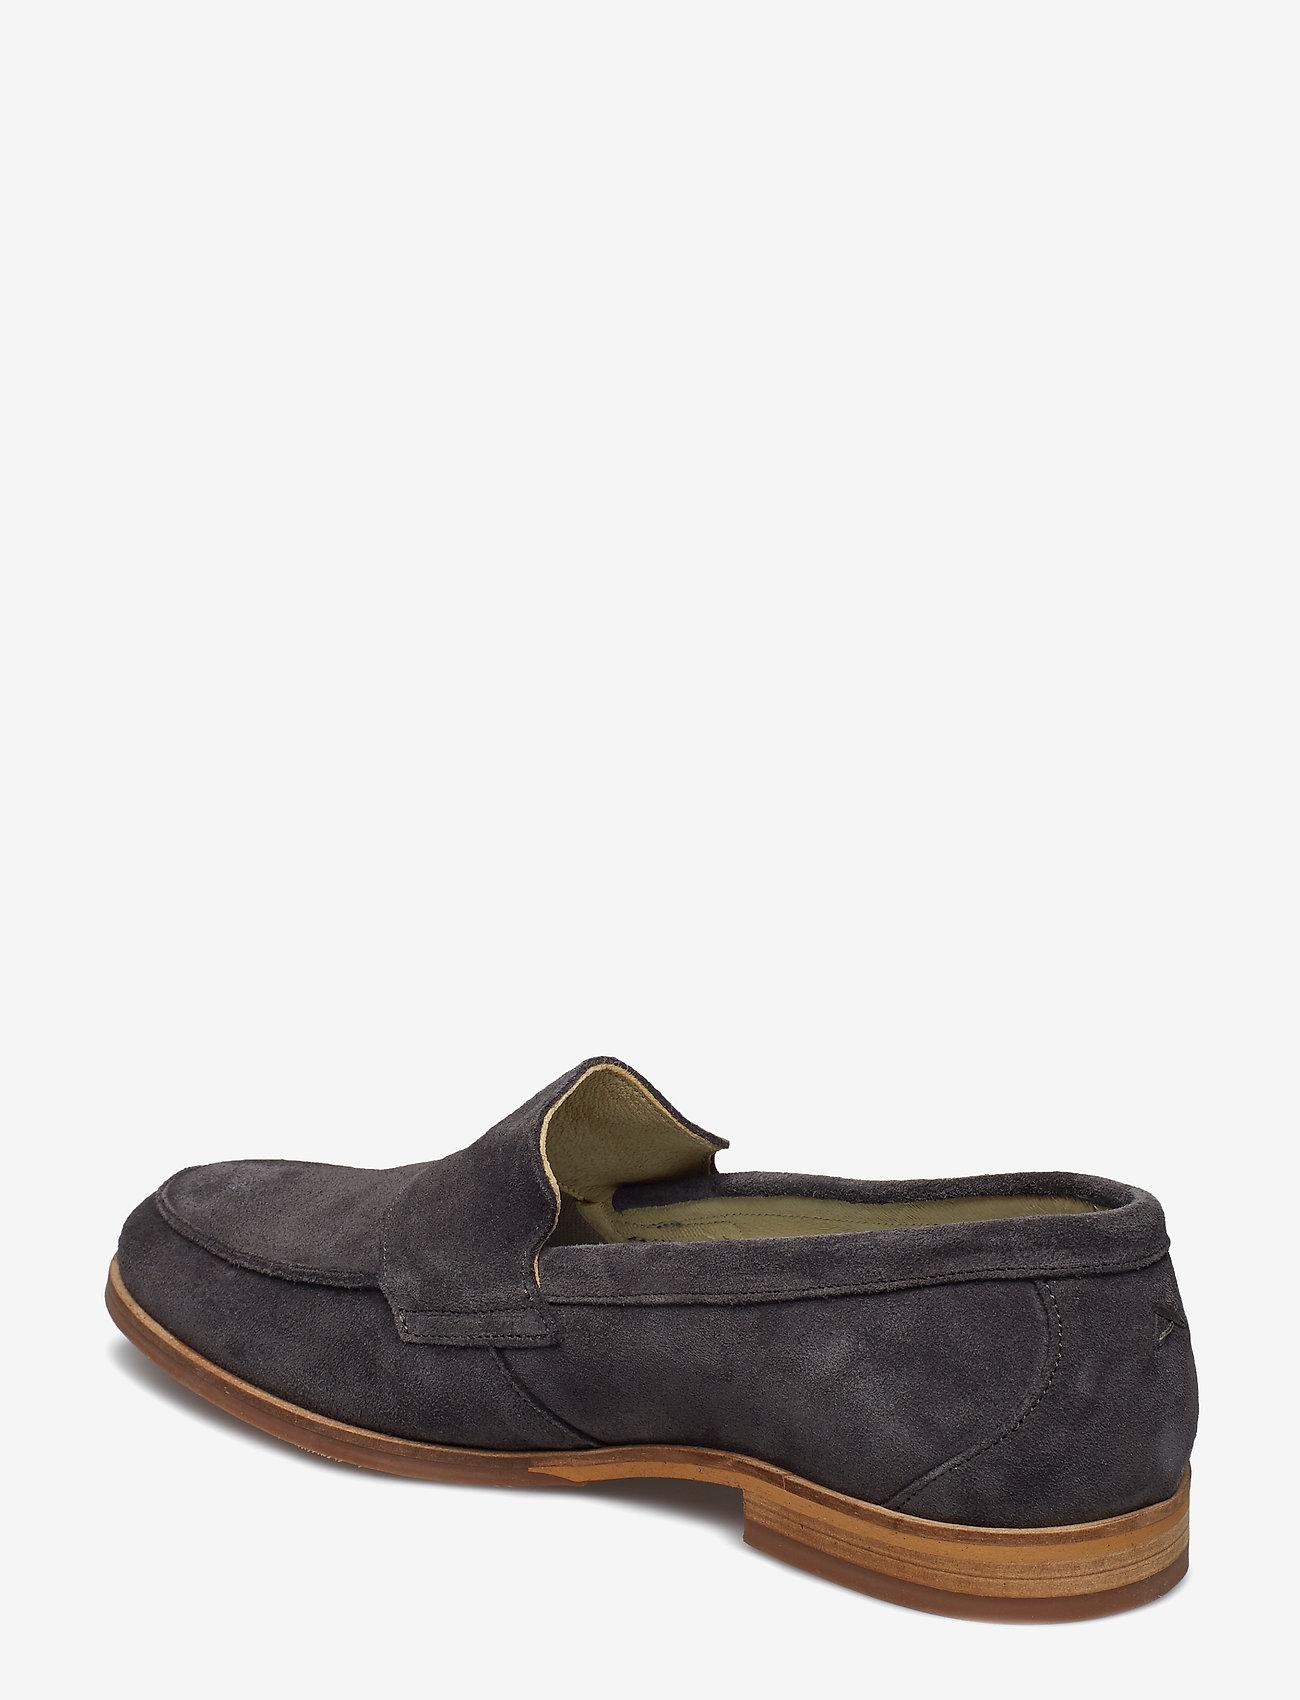 Dylan S (Dark Grey) - Shoe The Bear SaGj22